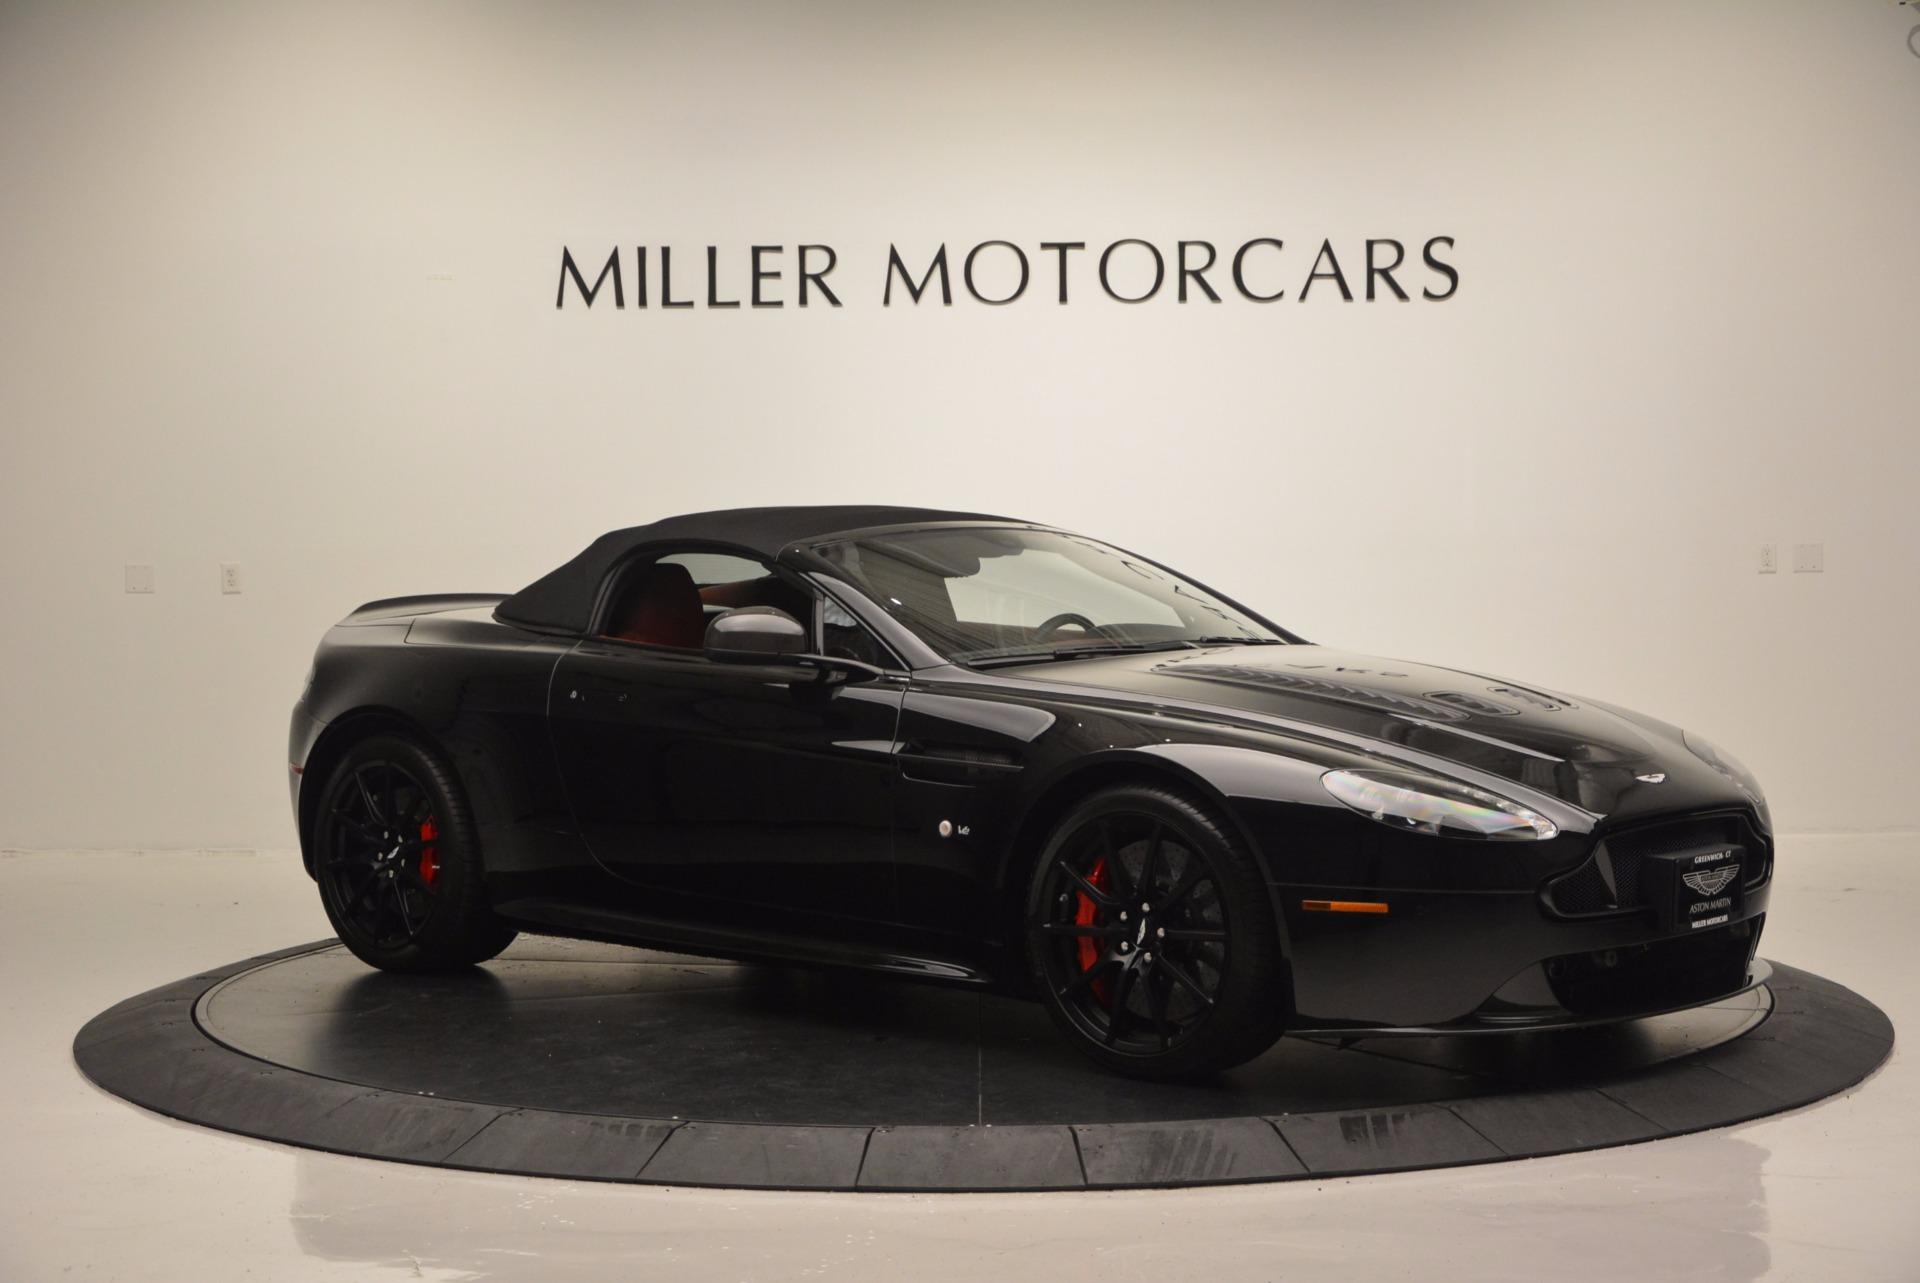 Used 2015 Aston Martin V12 Vantage S Roadster For Sale In Greenwich, CT. Alfa Romeo of Greenwich, 7227 1335_p16